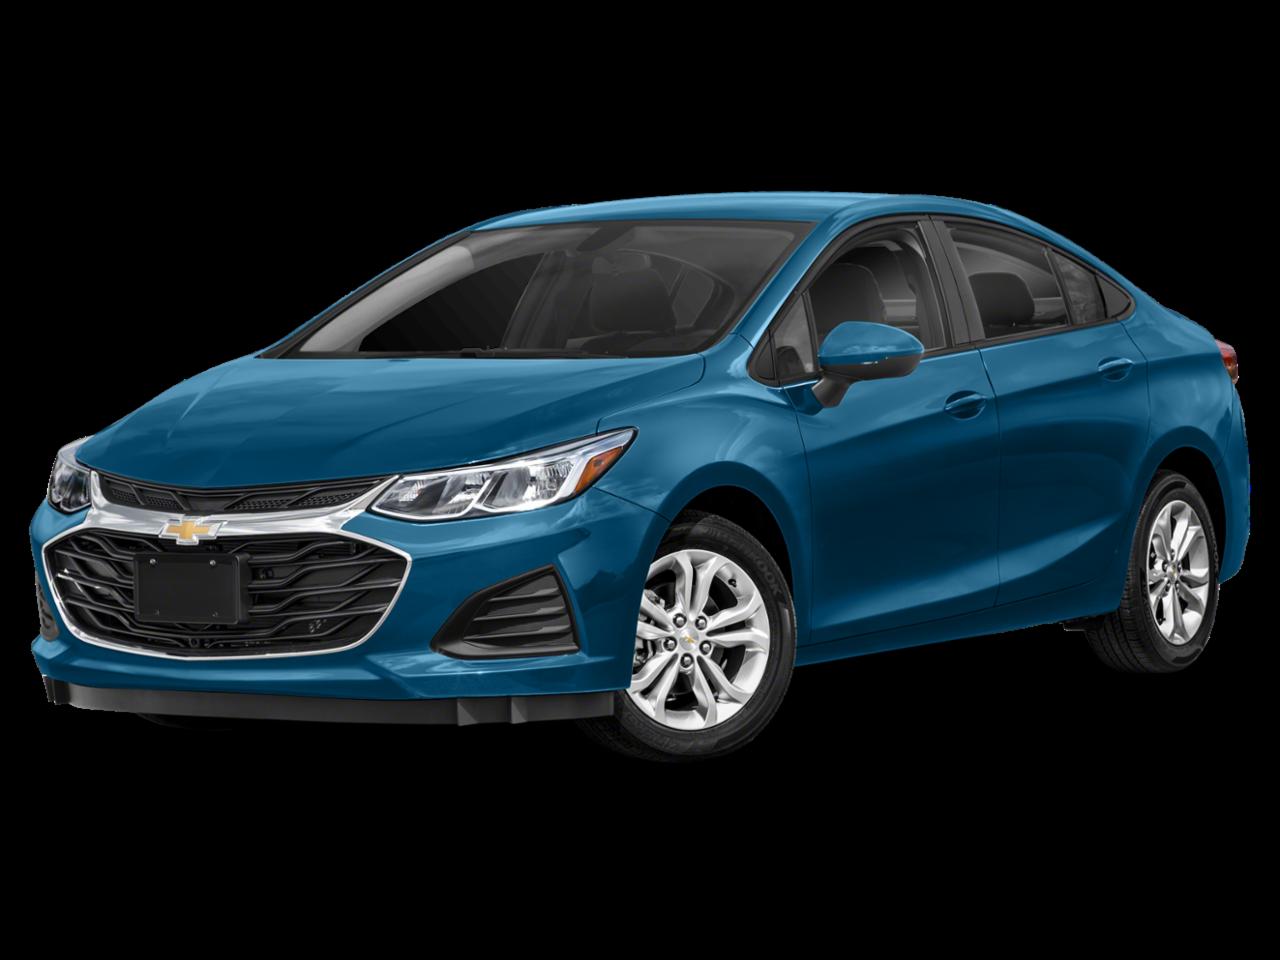 Chevrolet 2019 Cruze Standard